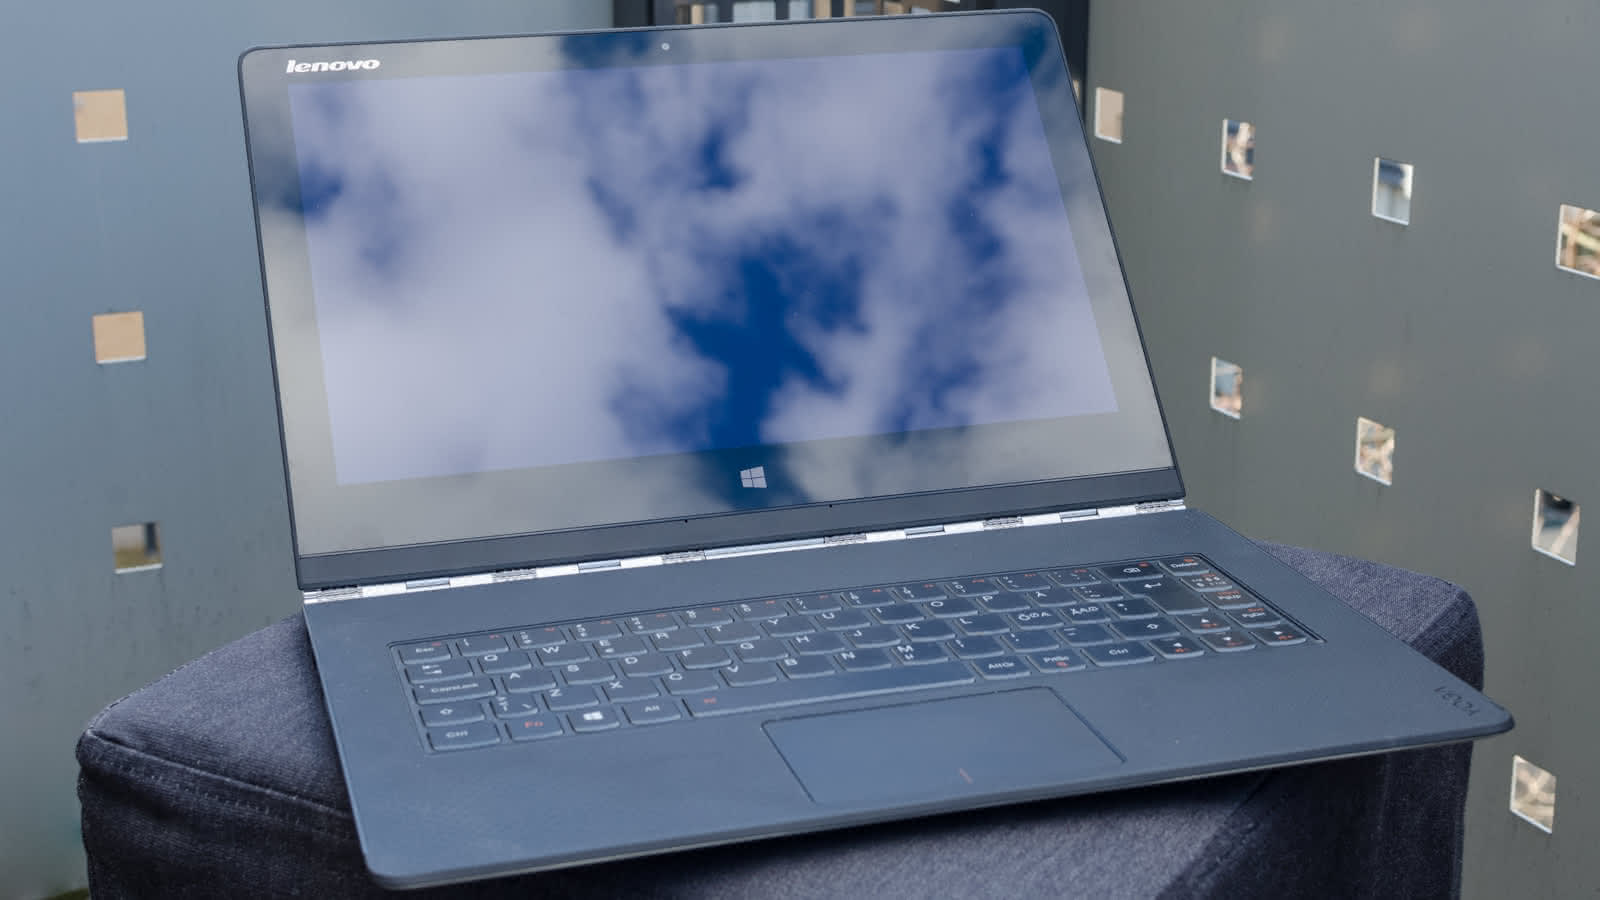 lenovo yoga 3 pro touchpad driver windows 10